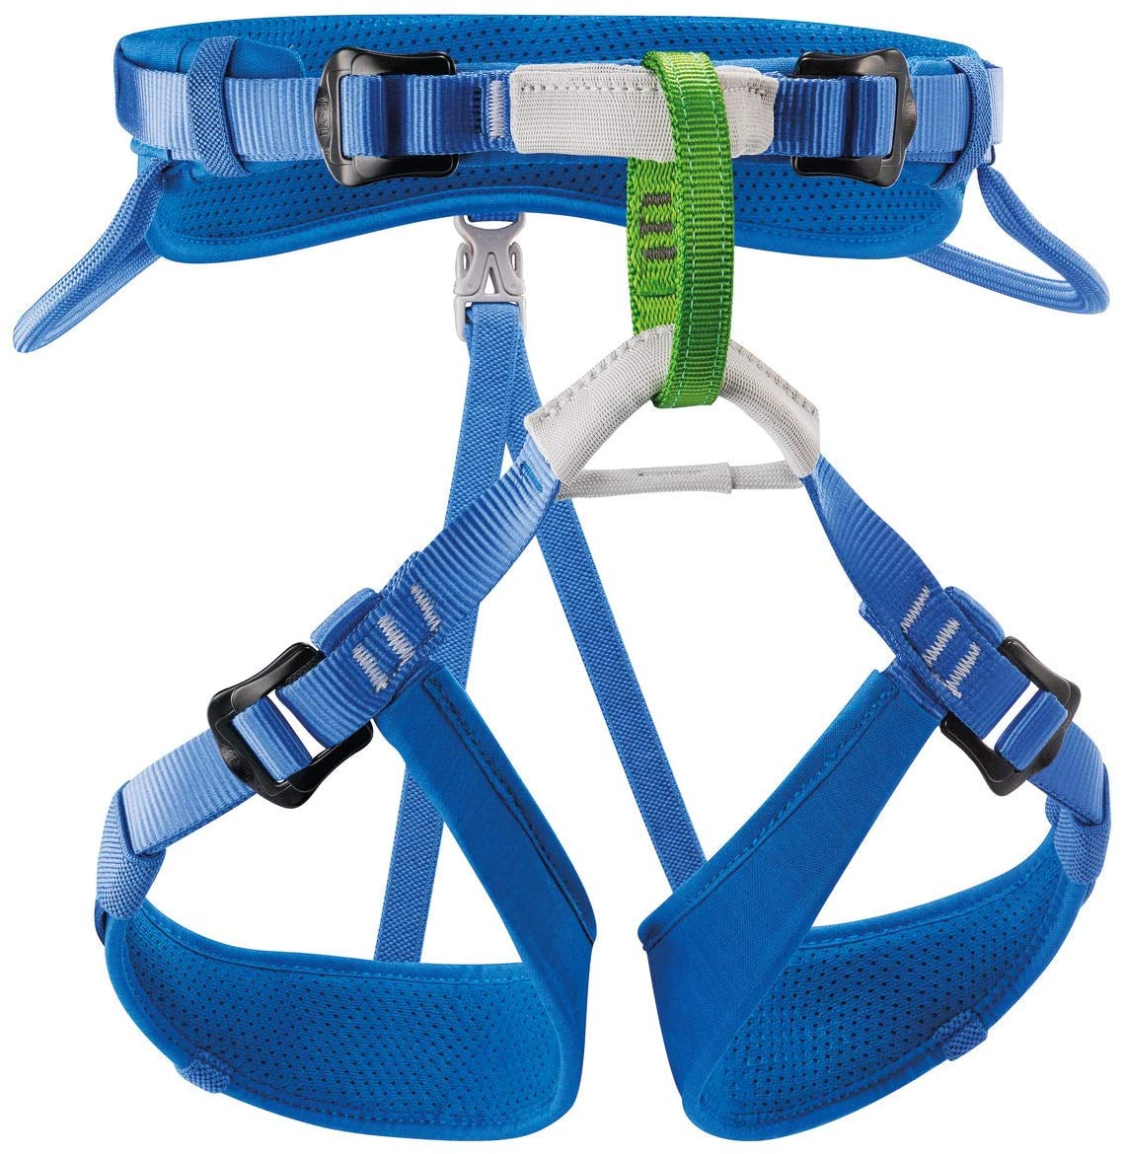 PETZL Macchu Junior Harness - AW20